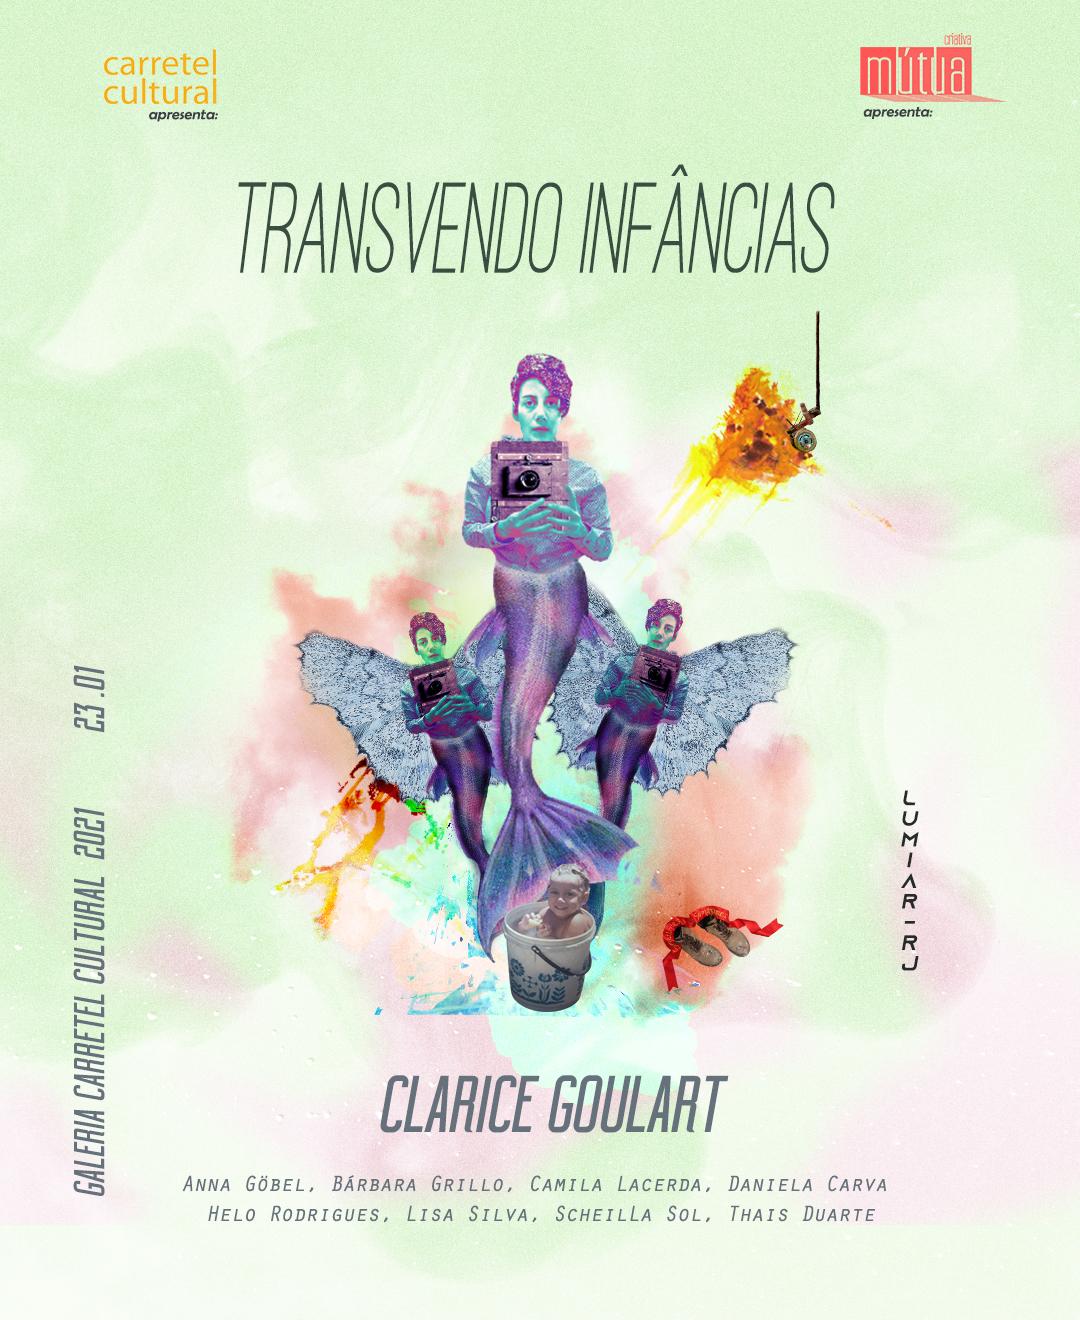 Clarice Goulart